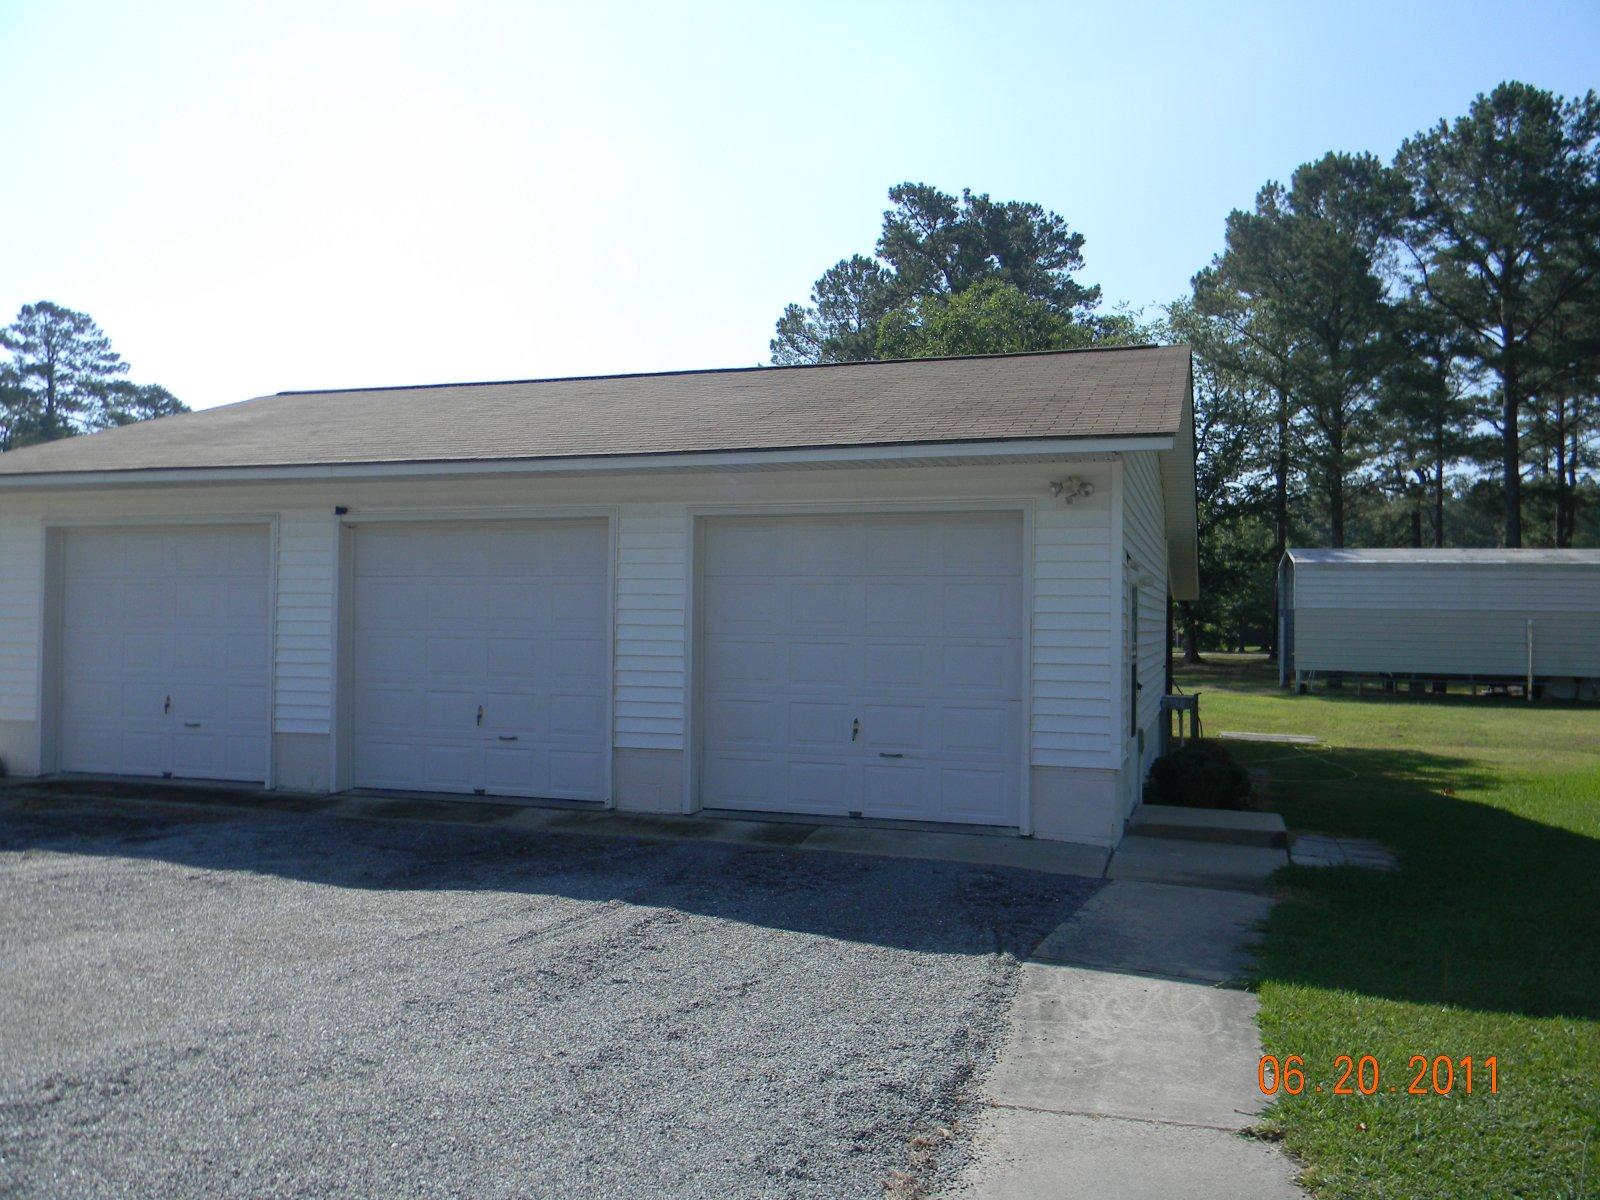 Click image for larger version  Name:garage June 2011 001.jpg Views:43 Size:324.8 KB ID:11390